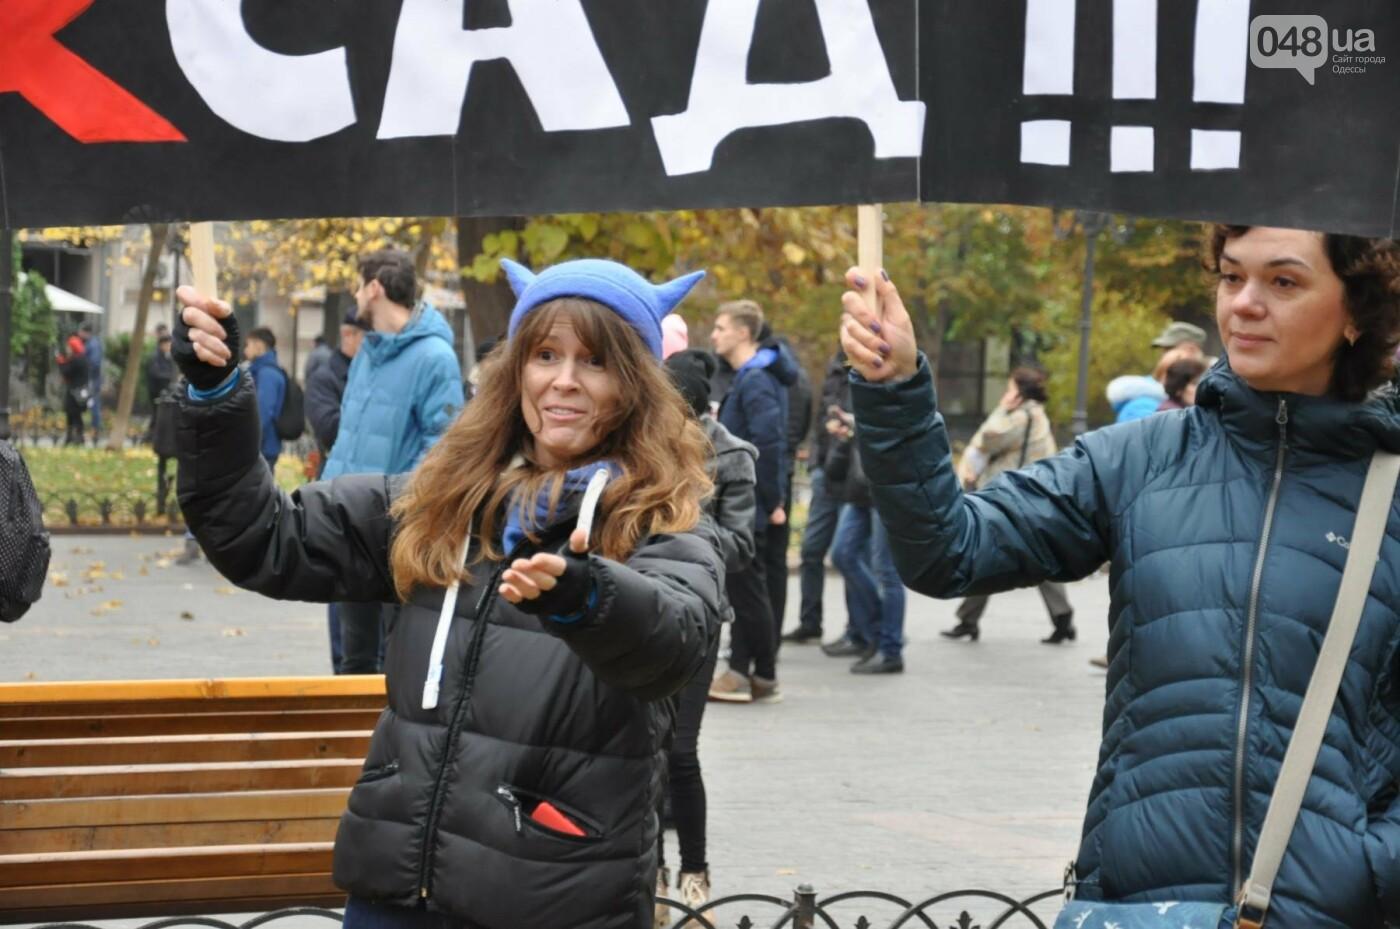 Около 5 сотен одесситов протестовали против застройки Горсада (ФОТО) , фото-12